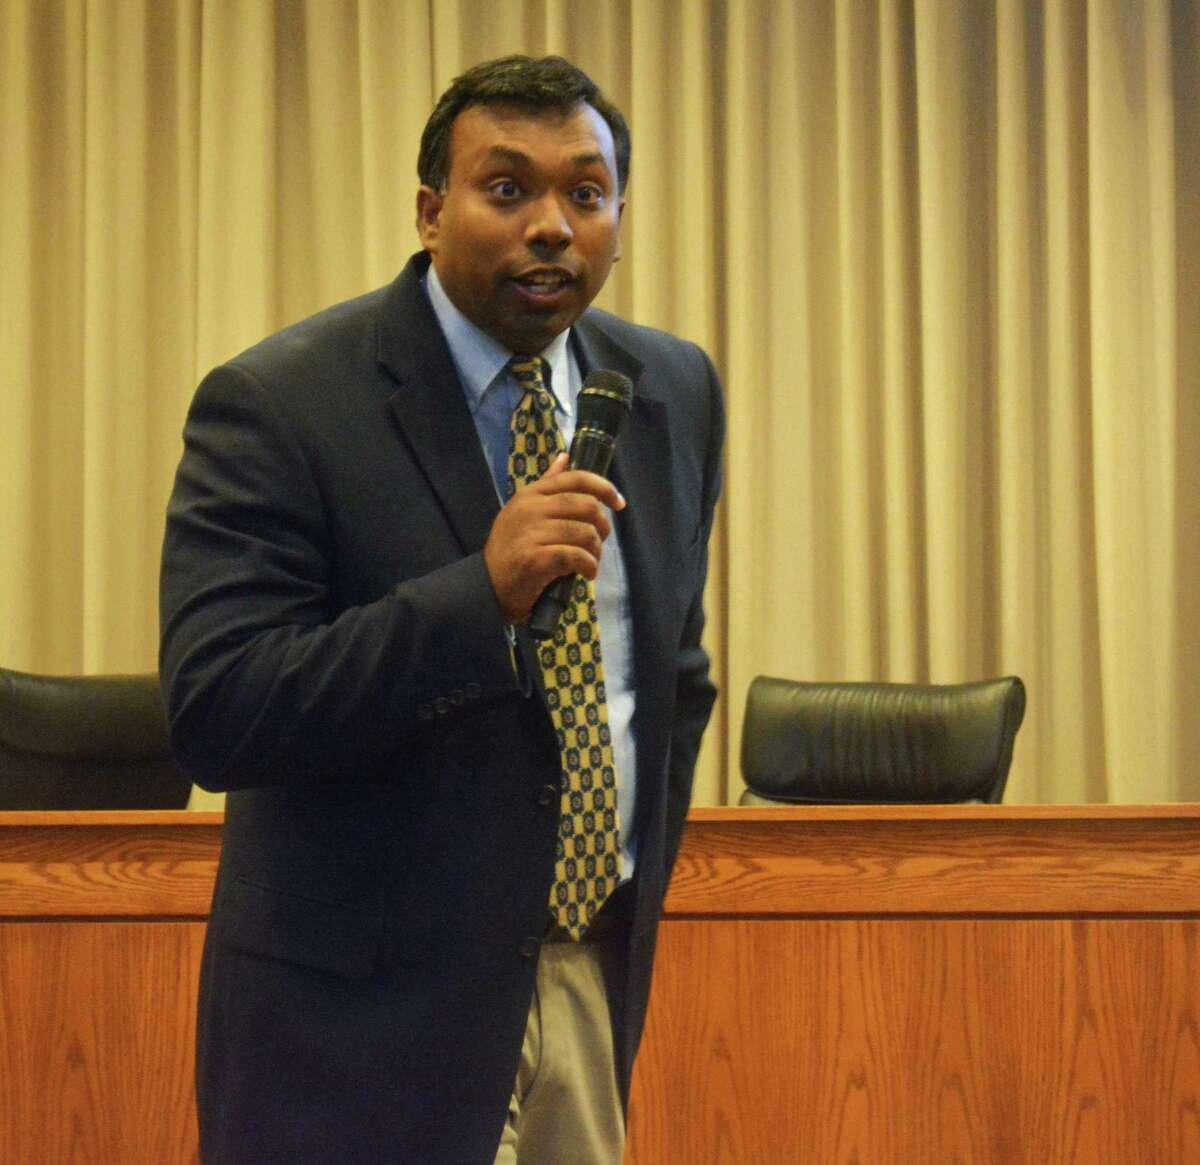 Middletown Parking Director Geen Thazhampallath is running for mayor.